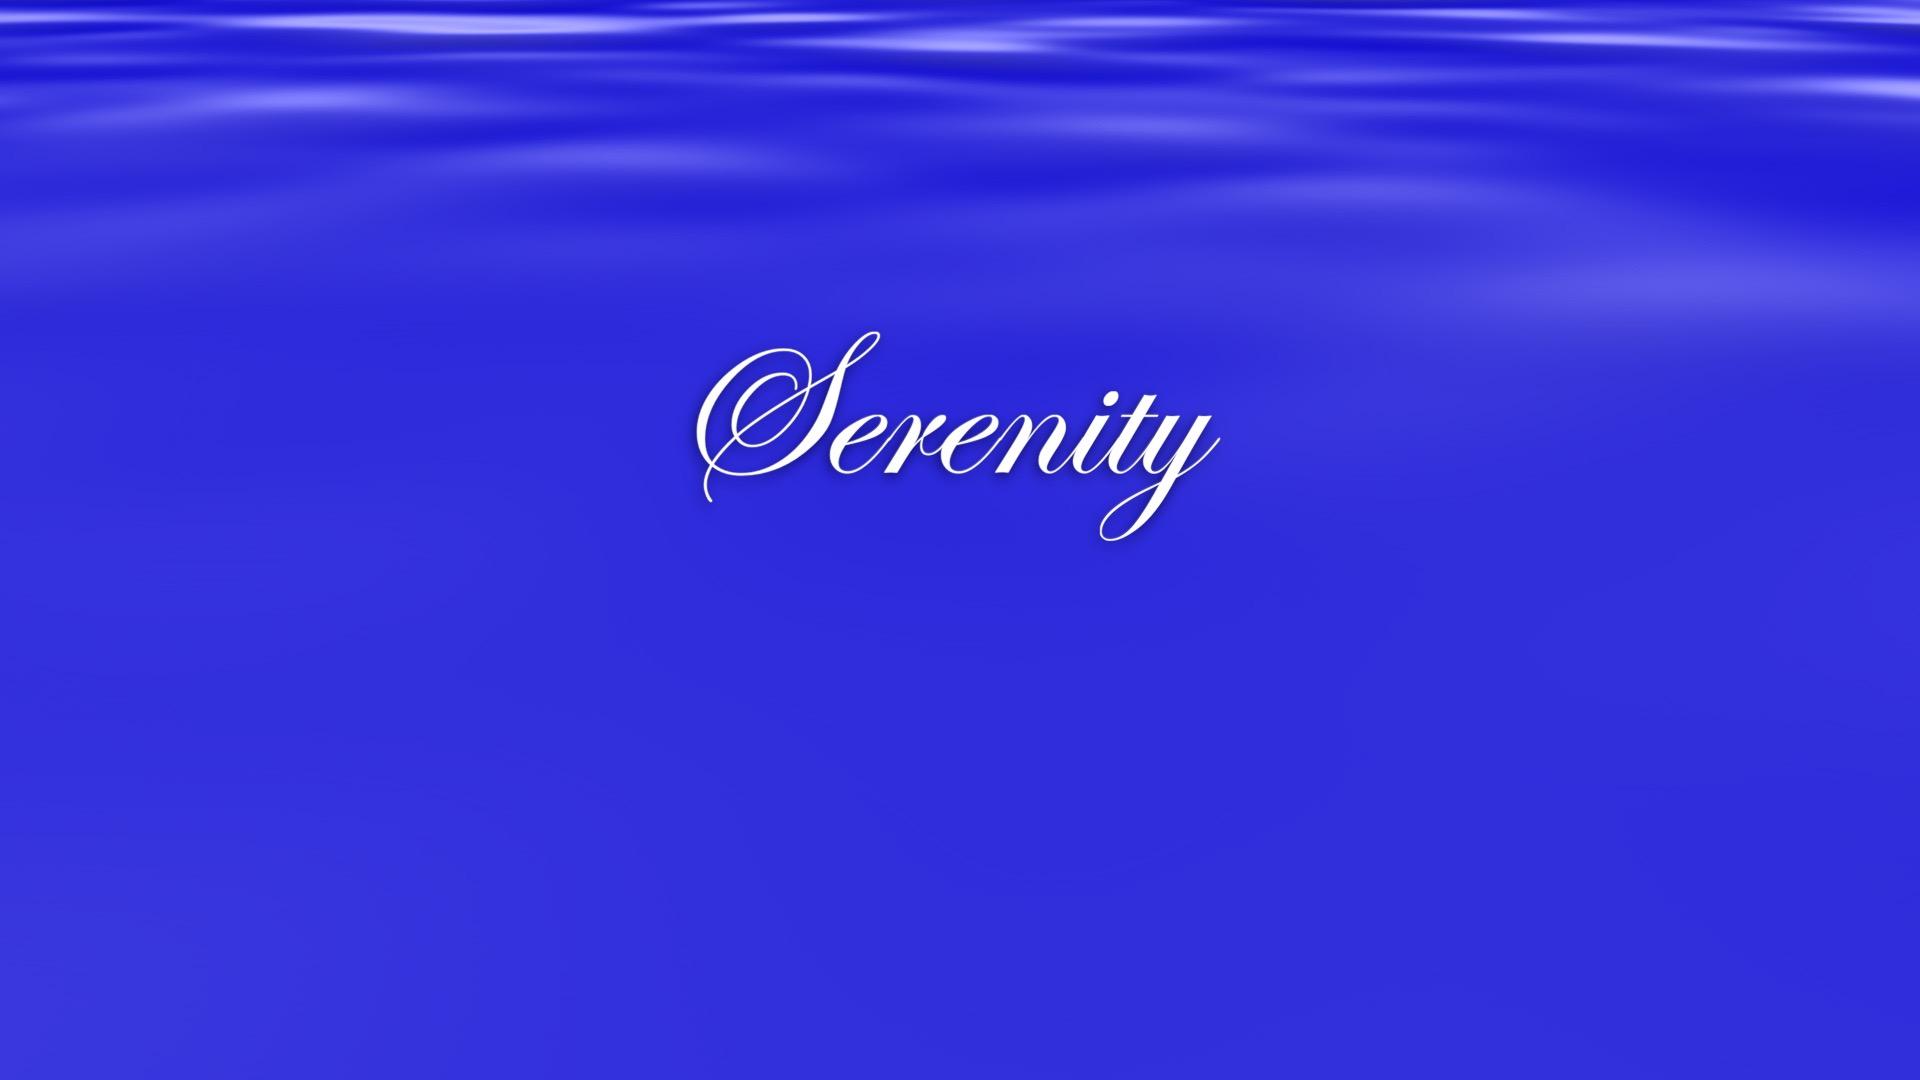 serenity-gallery1